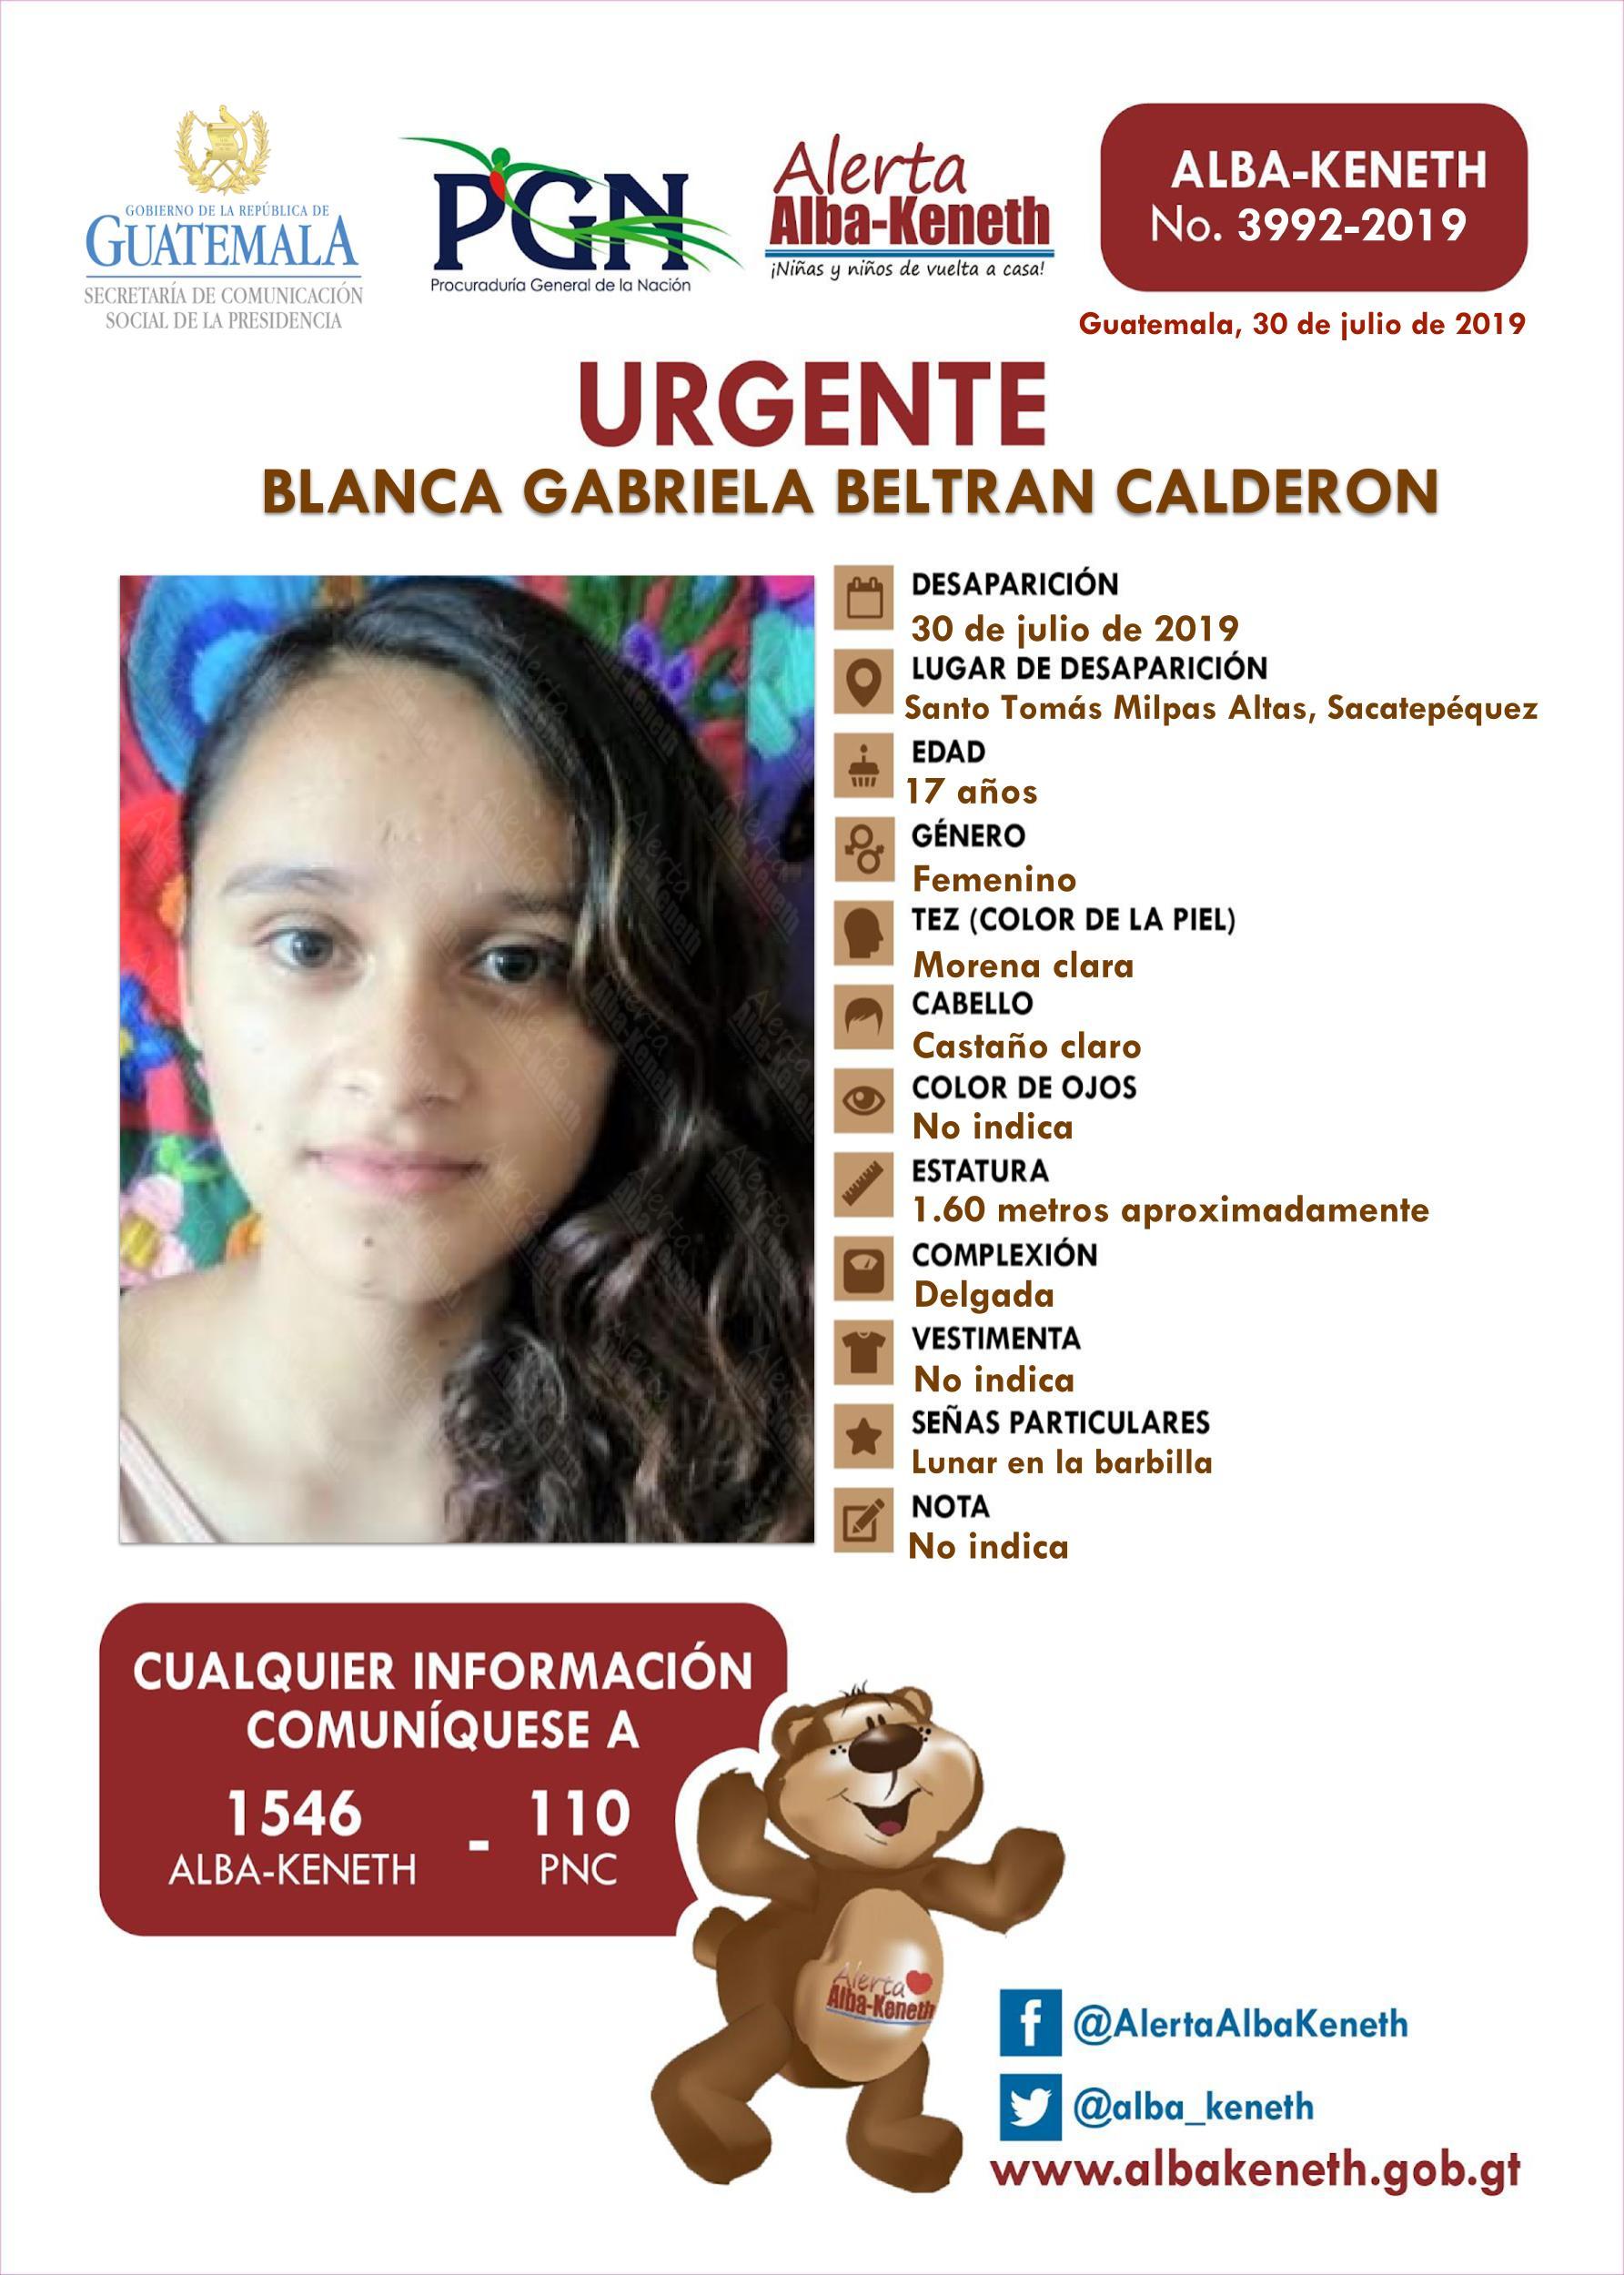 Blanca Gabriela Beltran Calderon